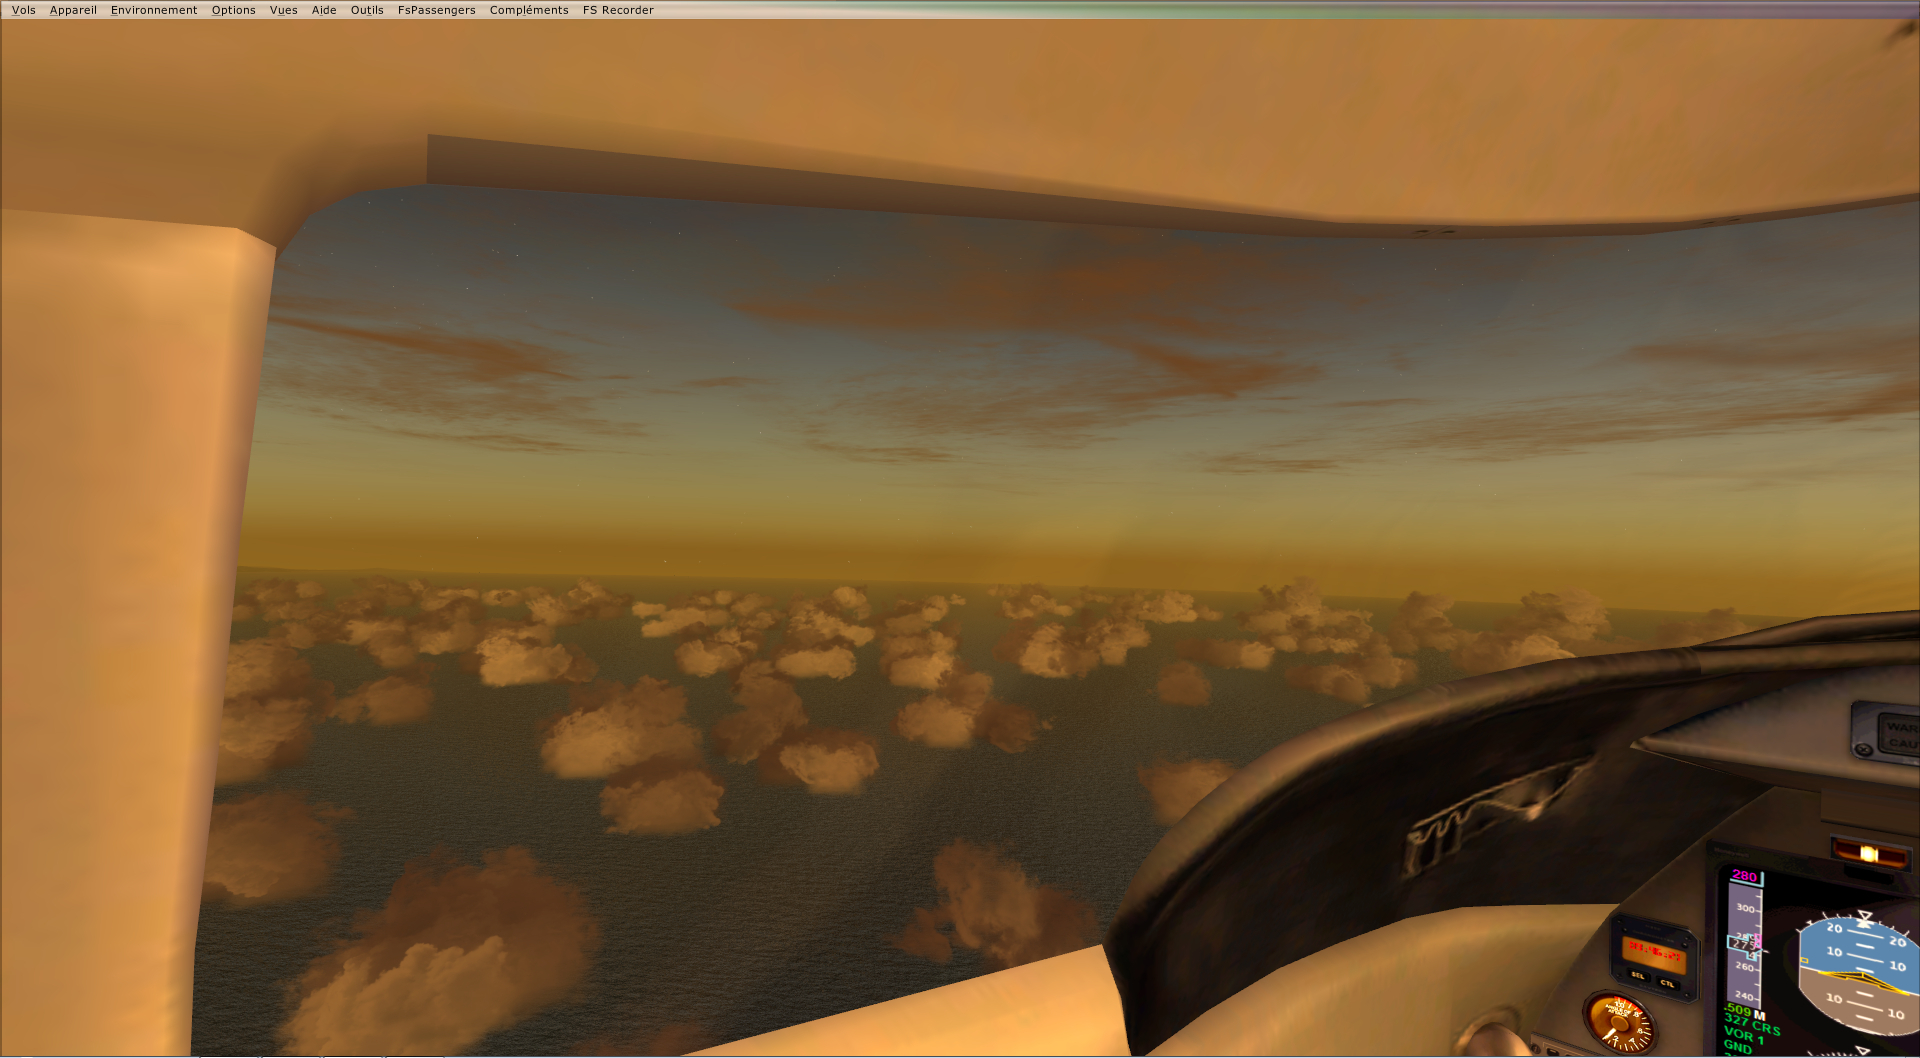 Essai demo X-Plane 10 - Page 2 2059322013572191661